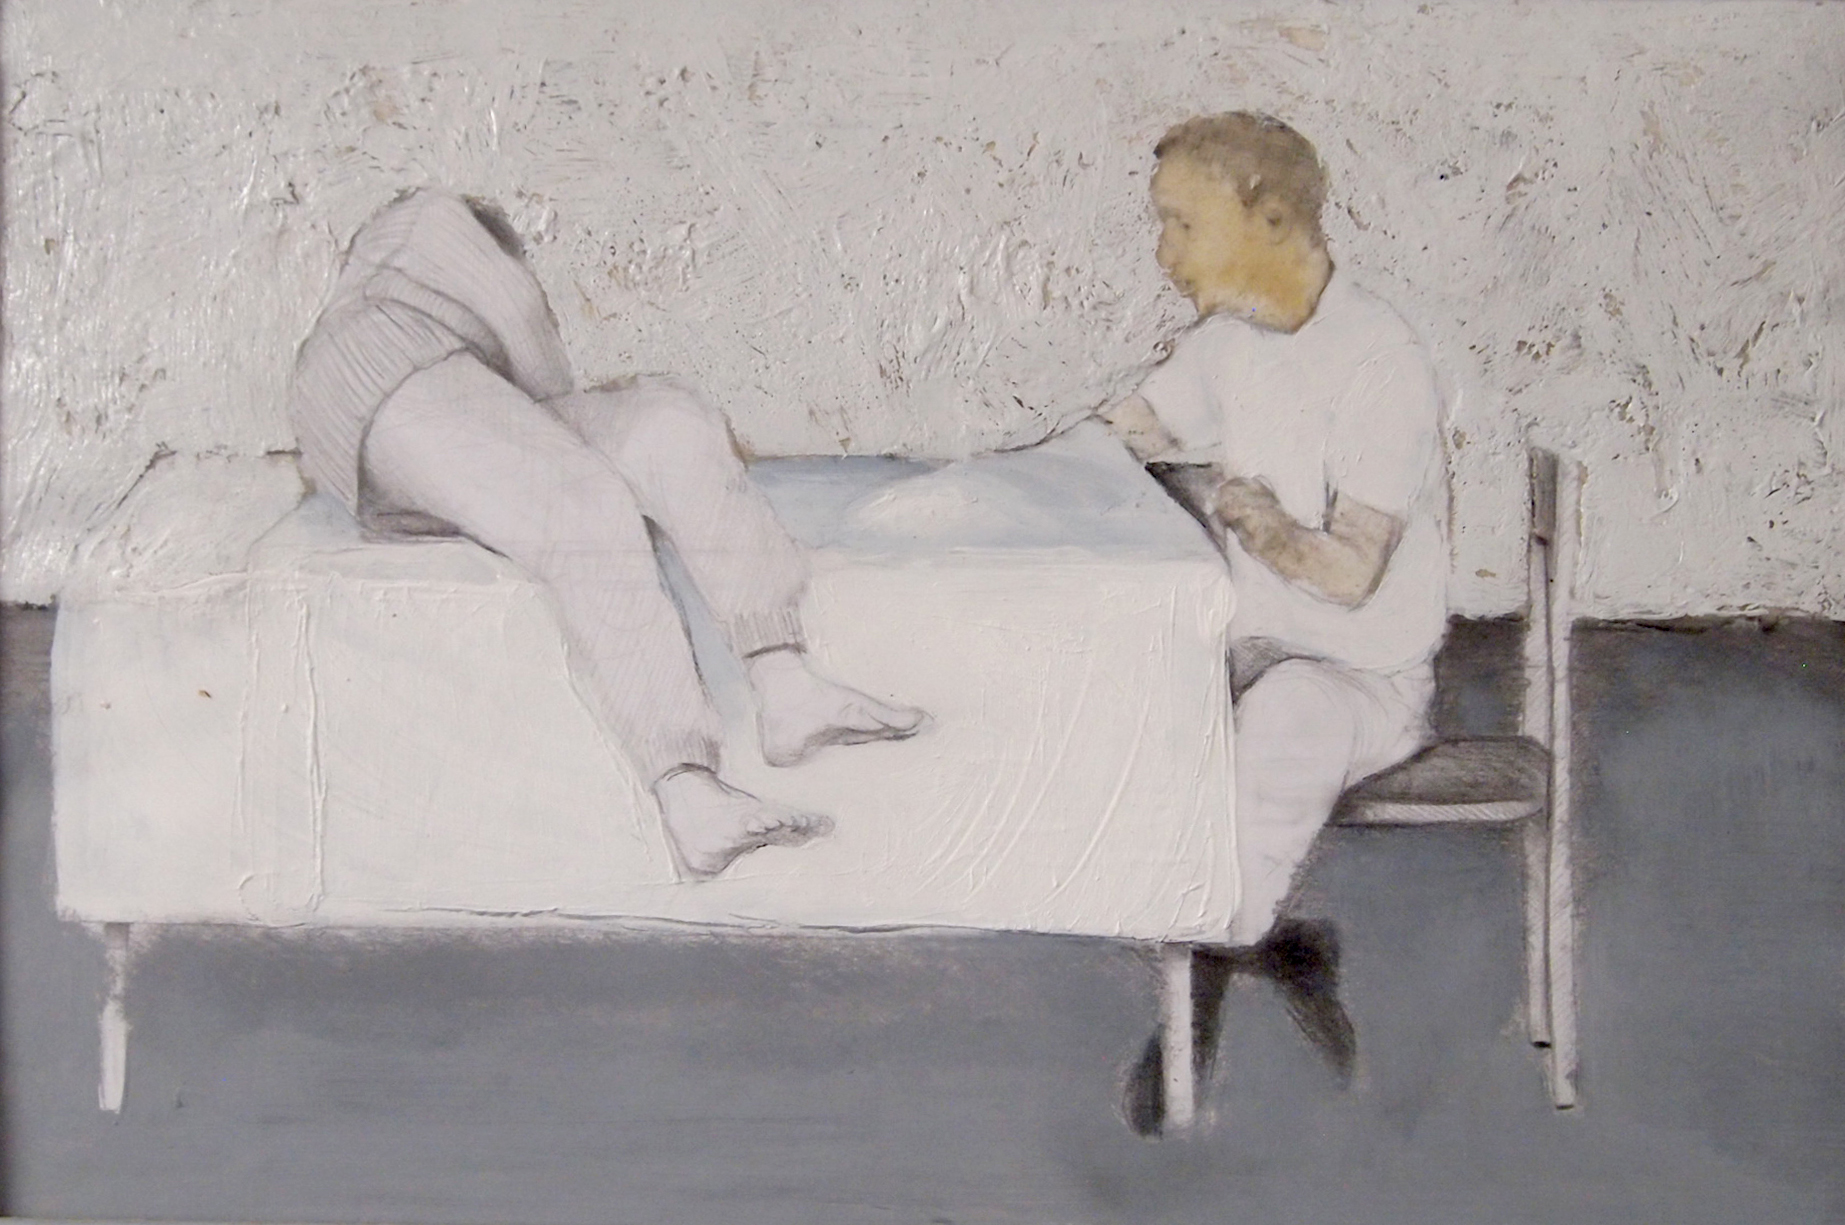 Rastislav Podhorský - Over tablecloth, 2012, Mixed media on paper, 21 x 29,7 cm Courtesy Gandy gallery